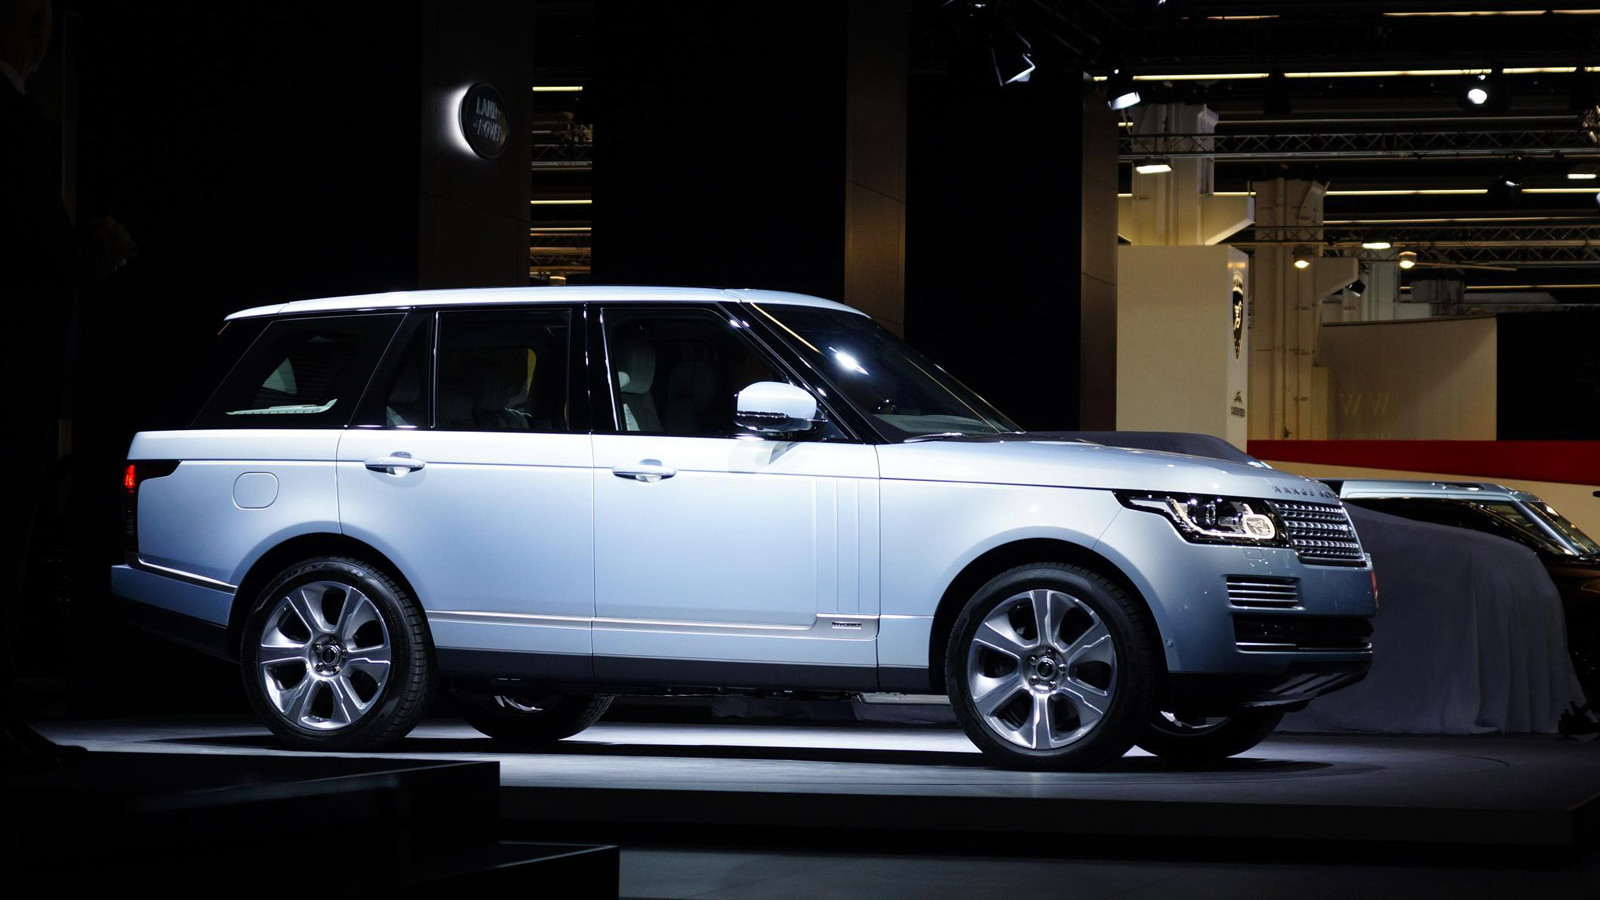 2015 Land Rover Range Rover Hybrid, 2013 Frankfurt Auto Show